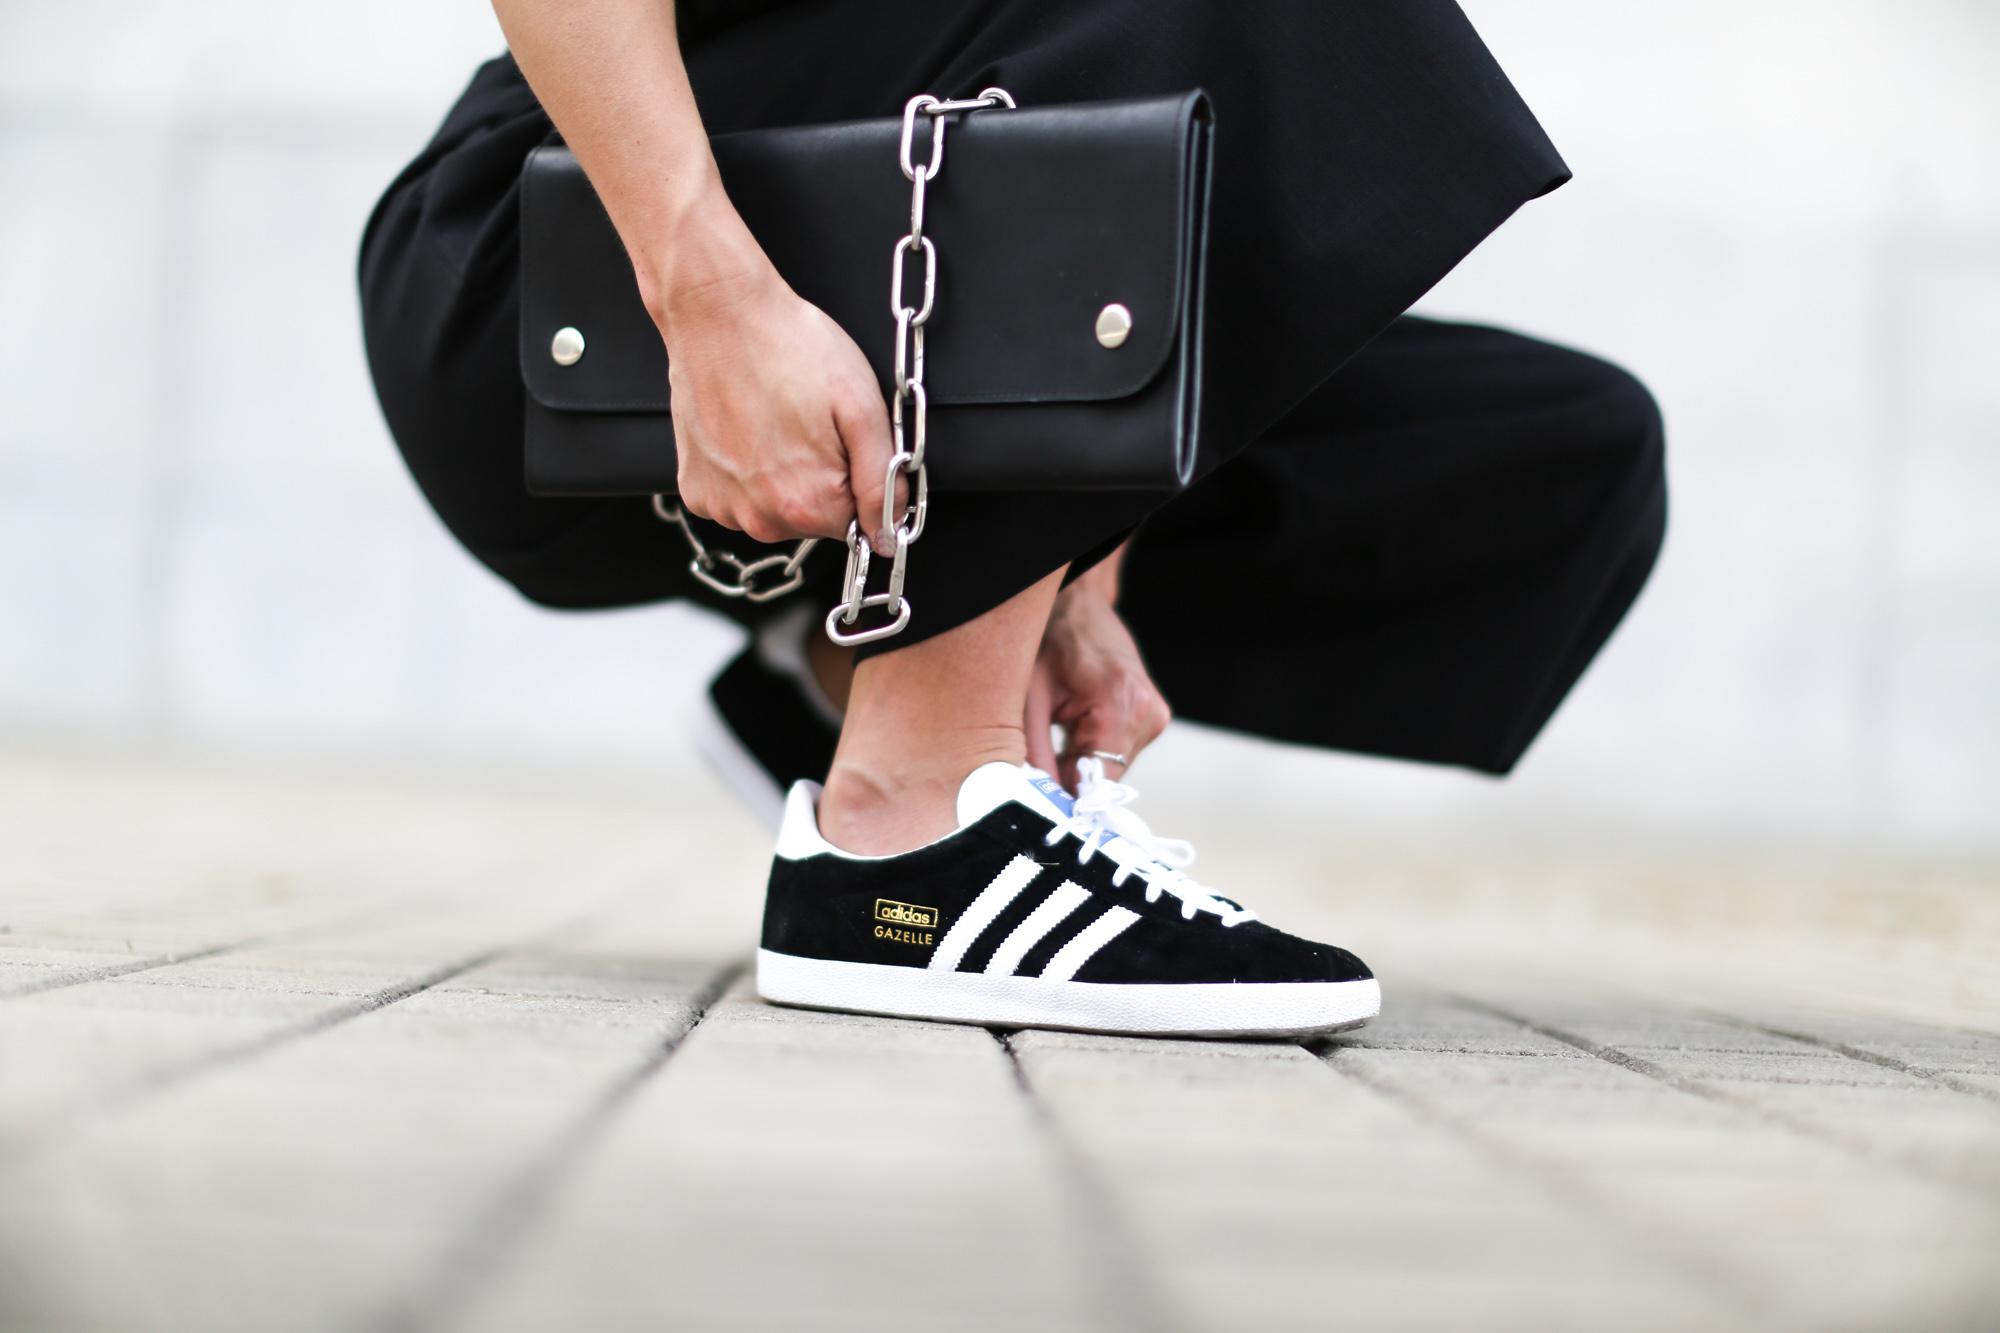 Adidas Gazelle Instagram athena 7 minuten